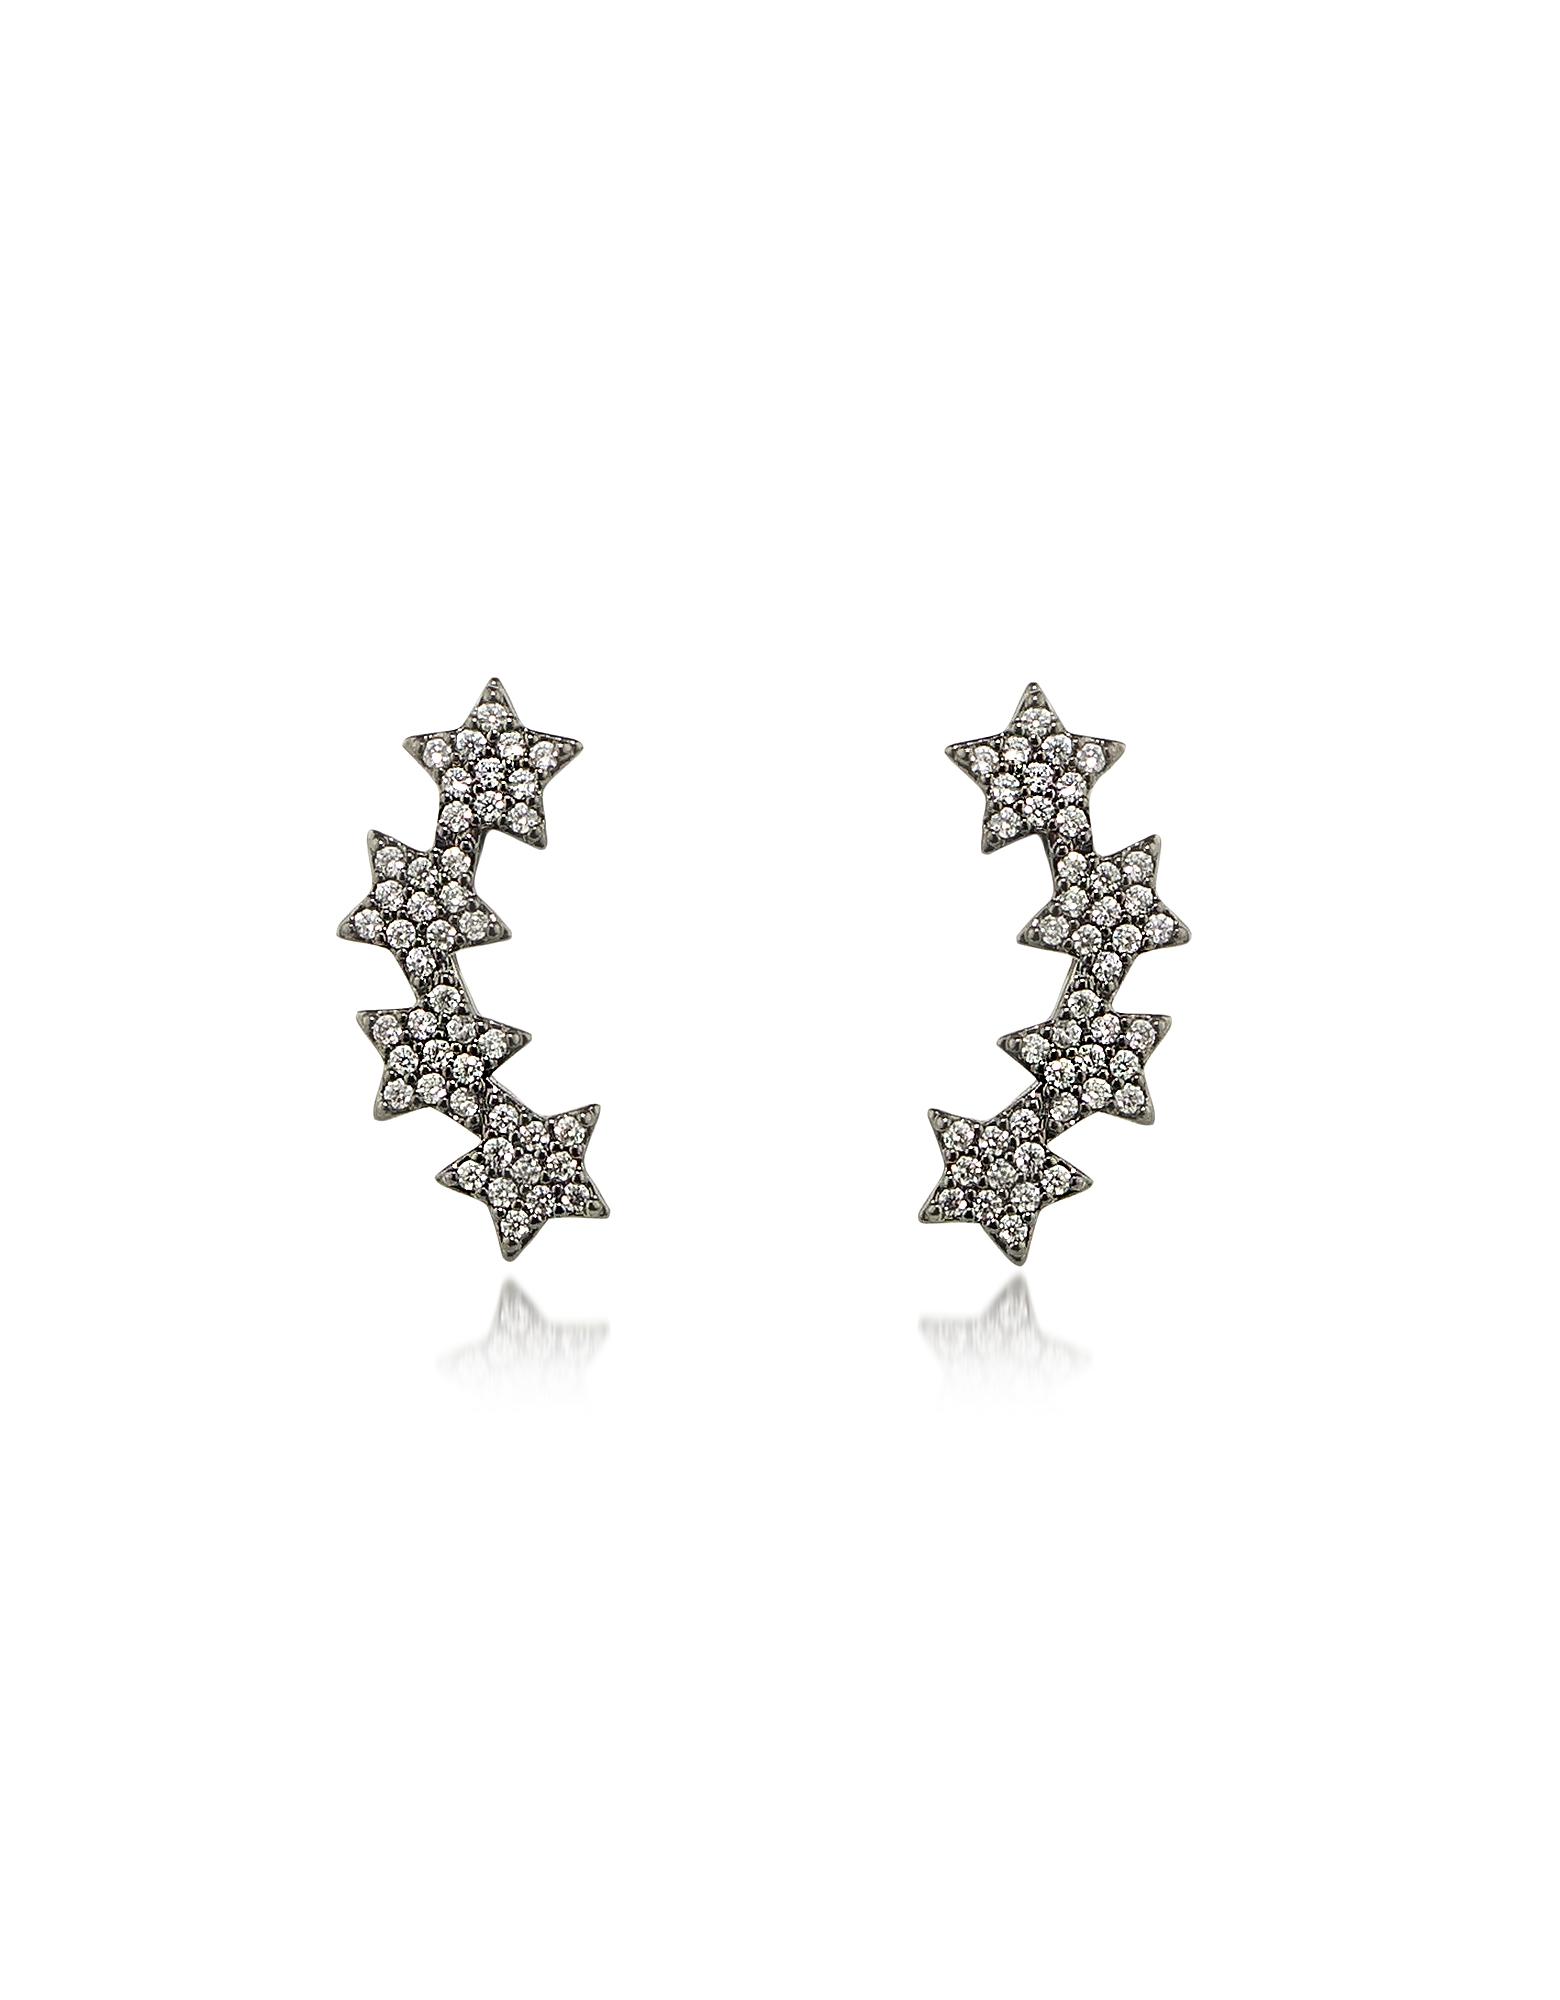 Federica Tosi Earrings, Lobo Multi Stars Earrings